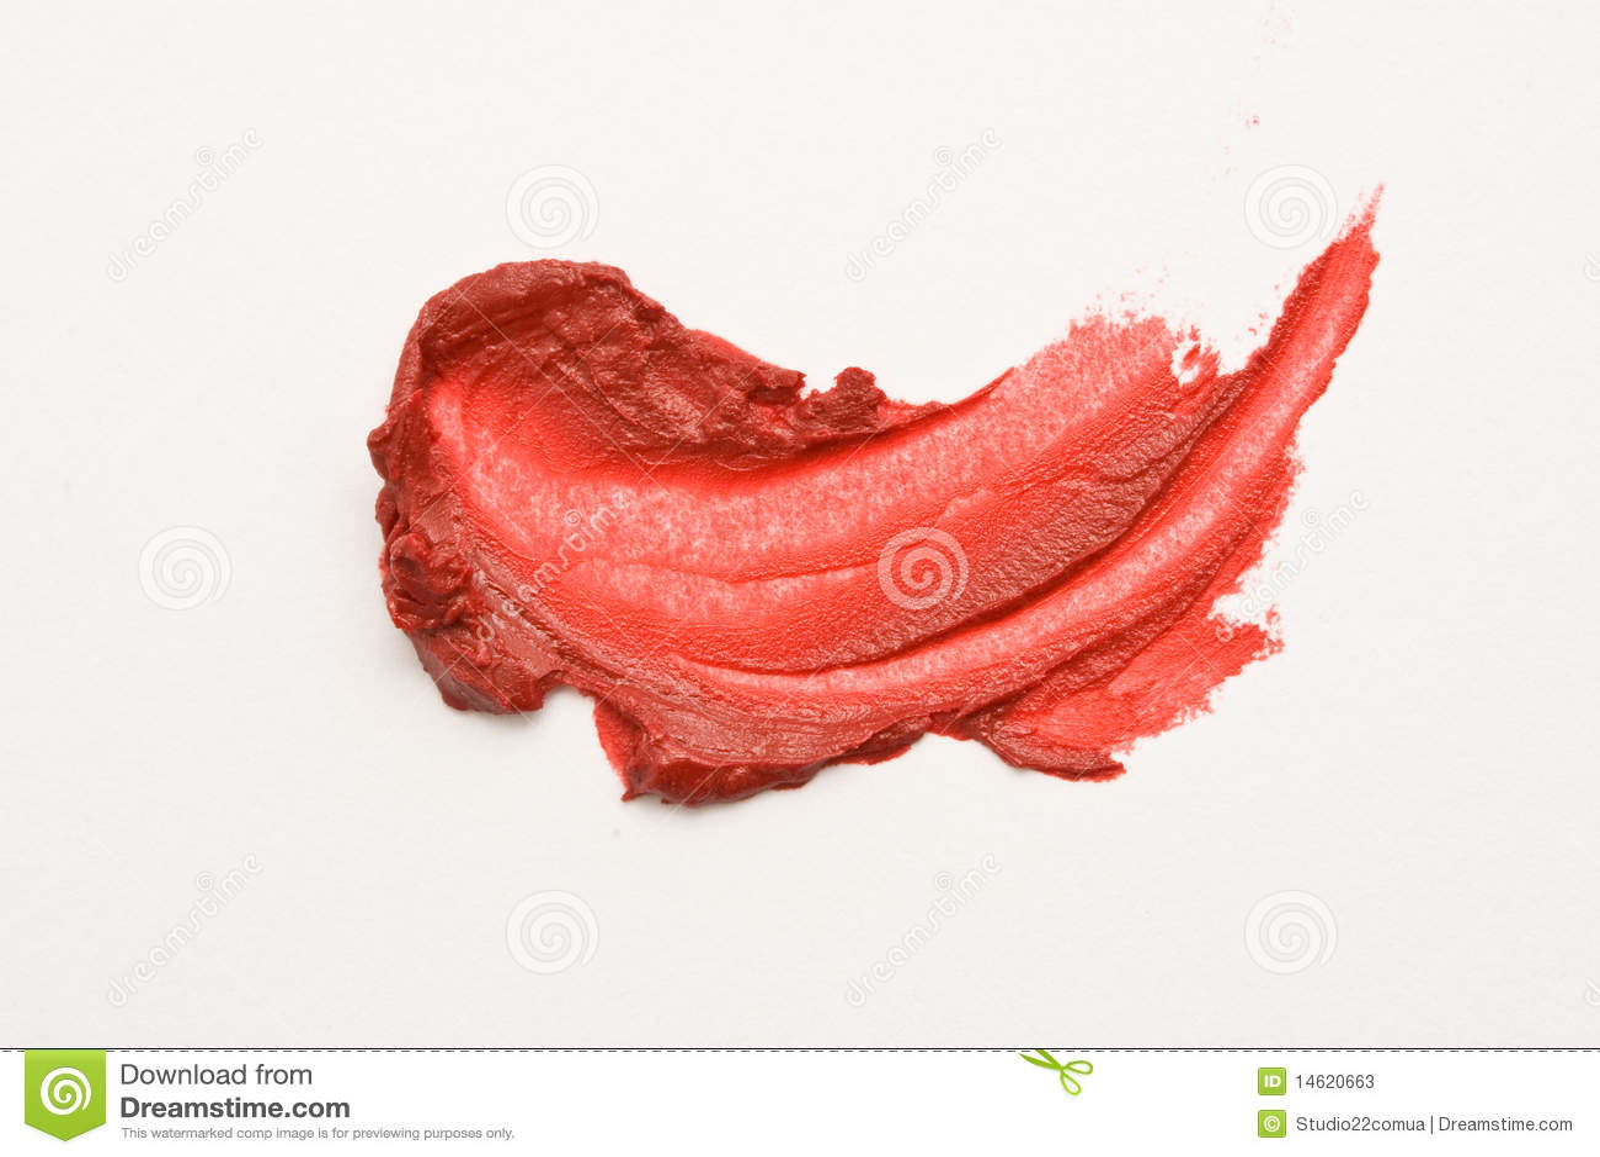 Images of Non Smudge Lipstick - Asatan